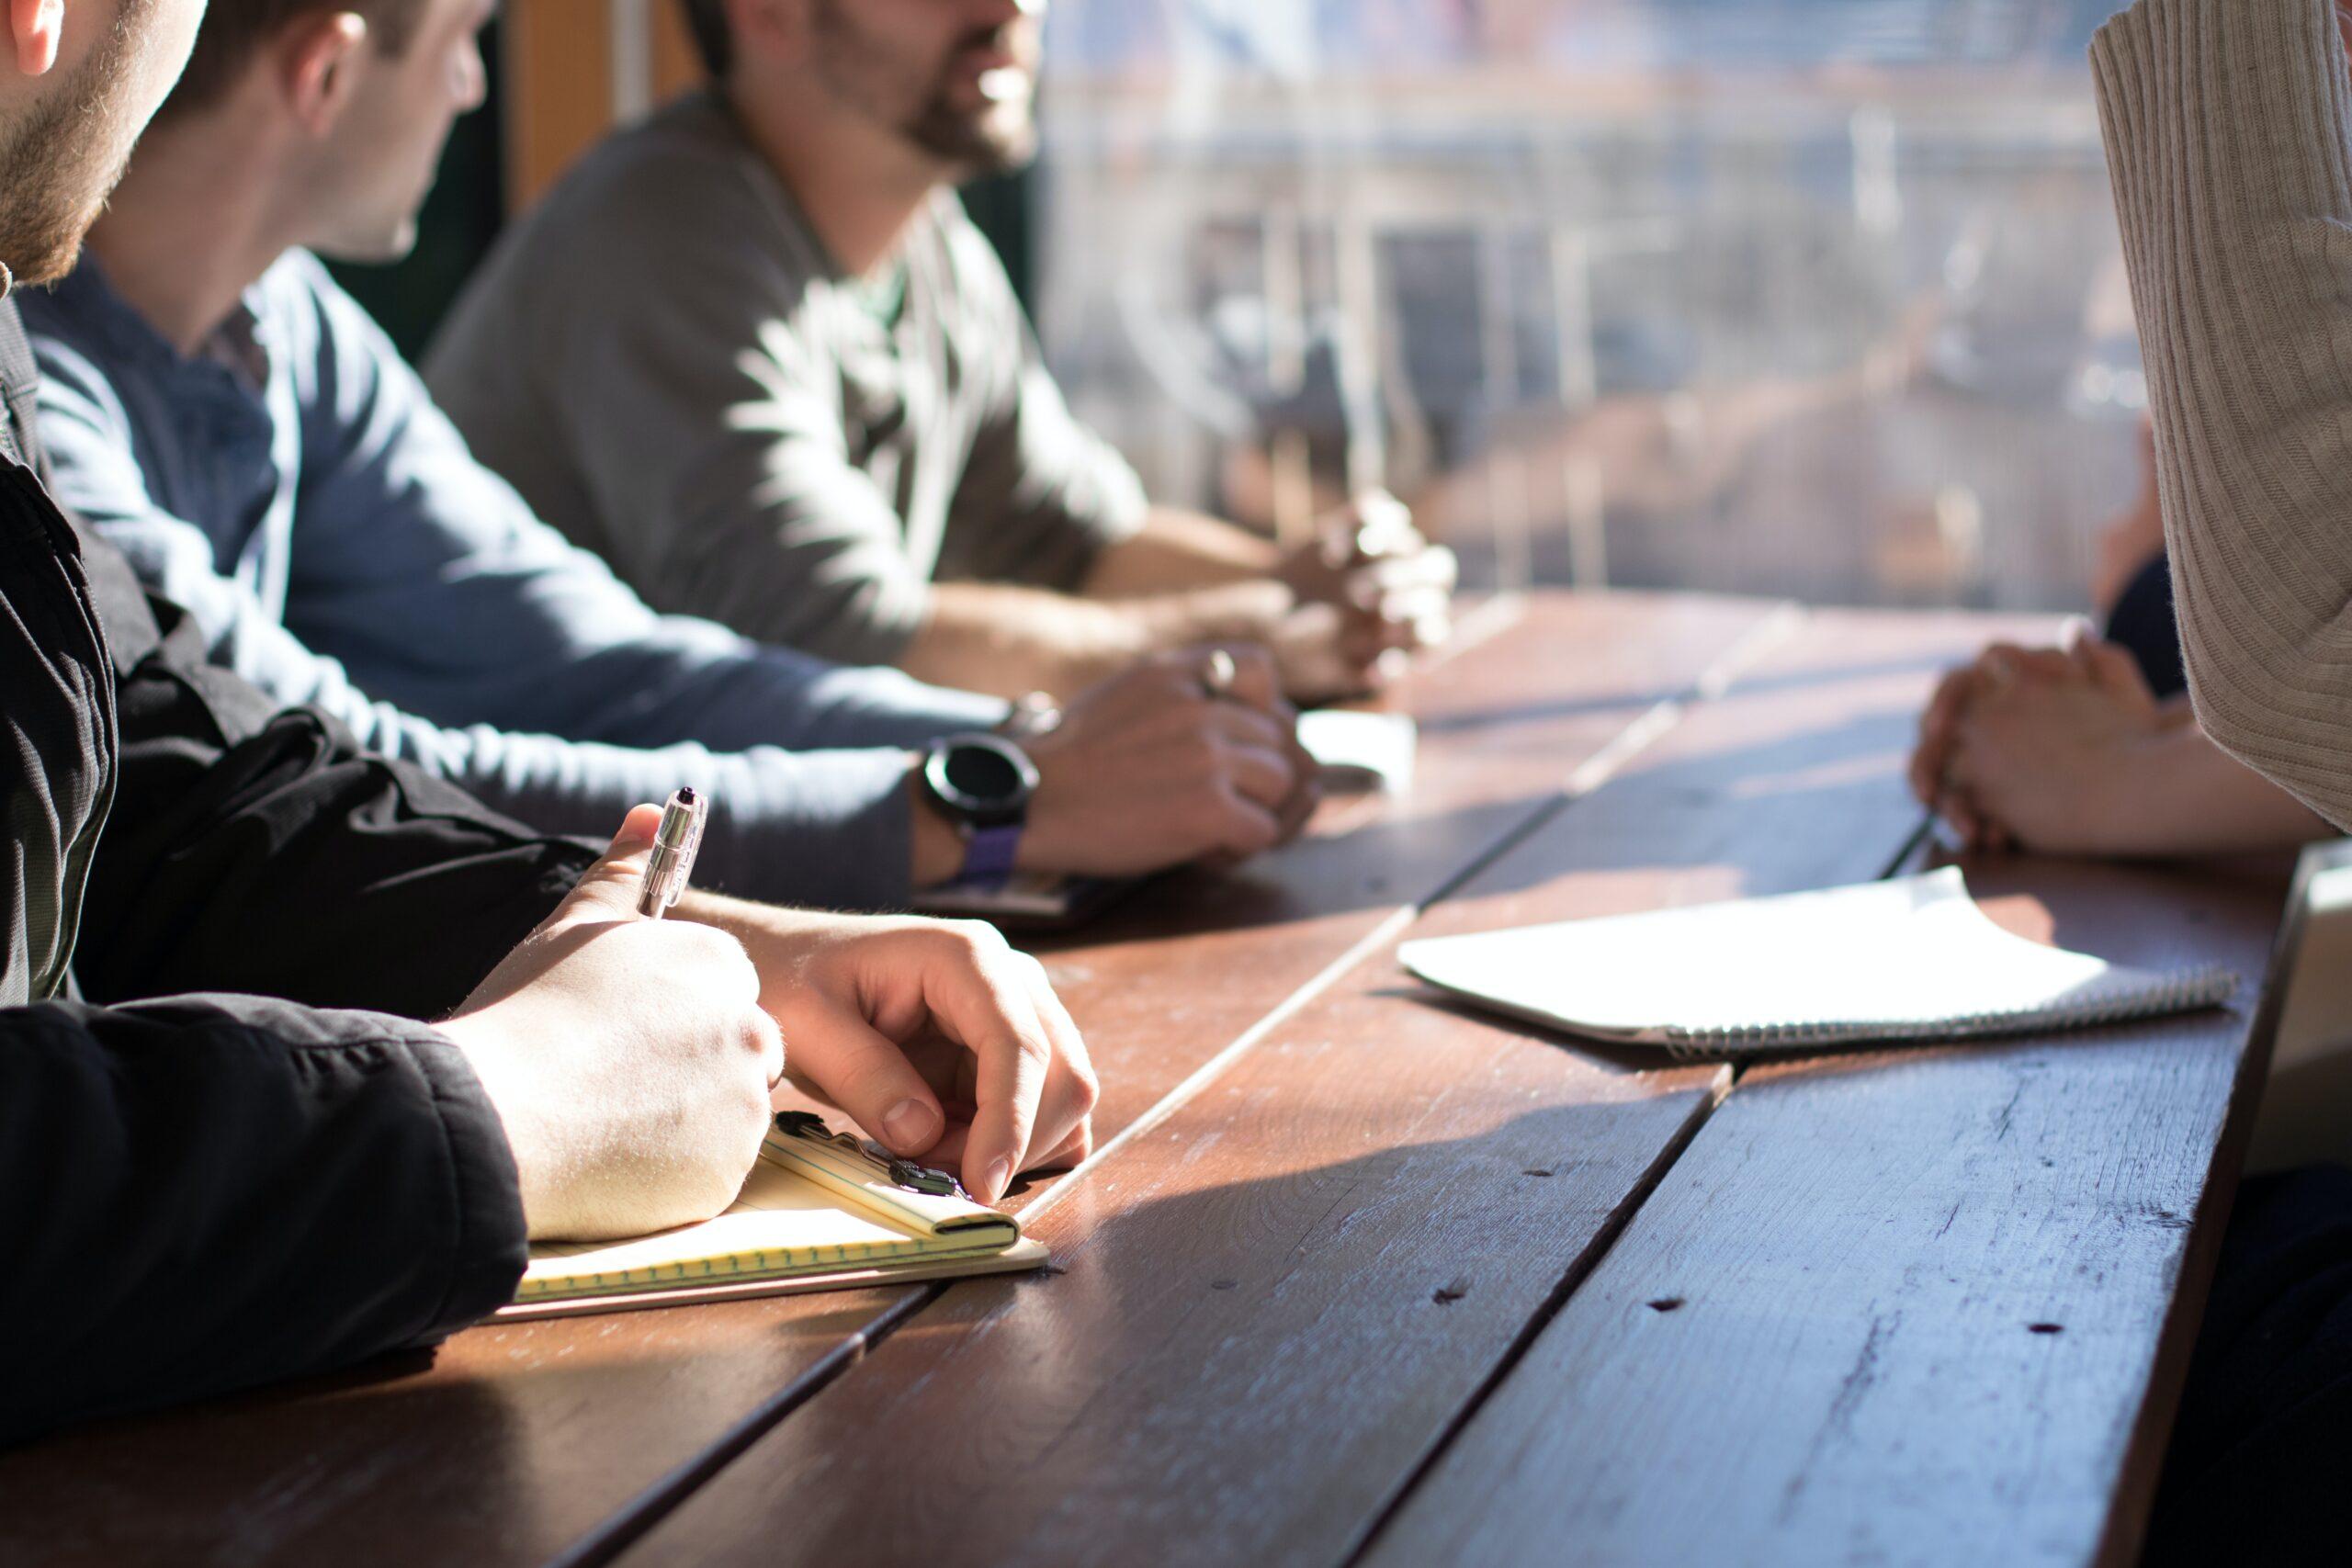 Team success in large organizations